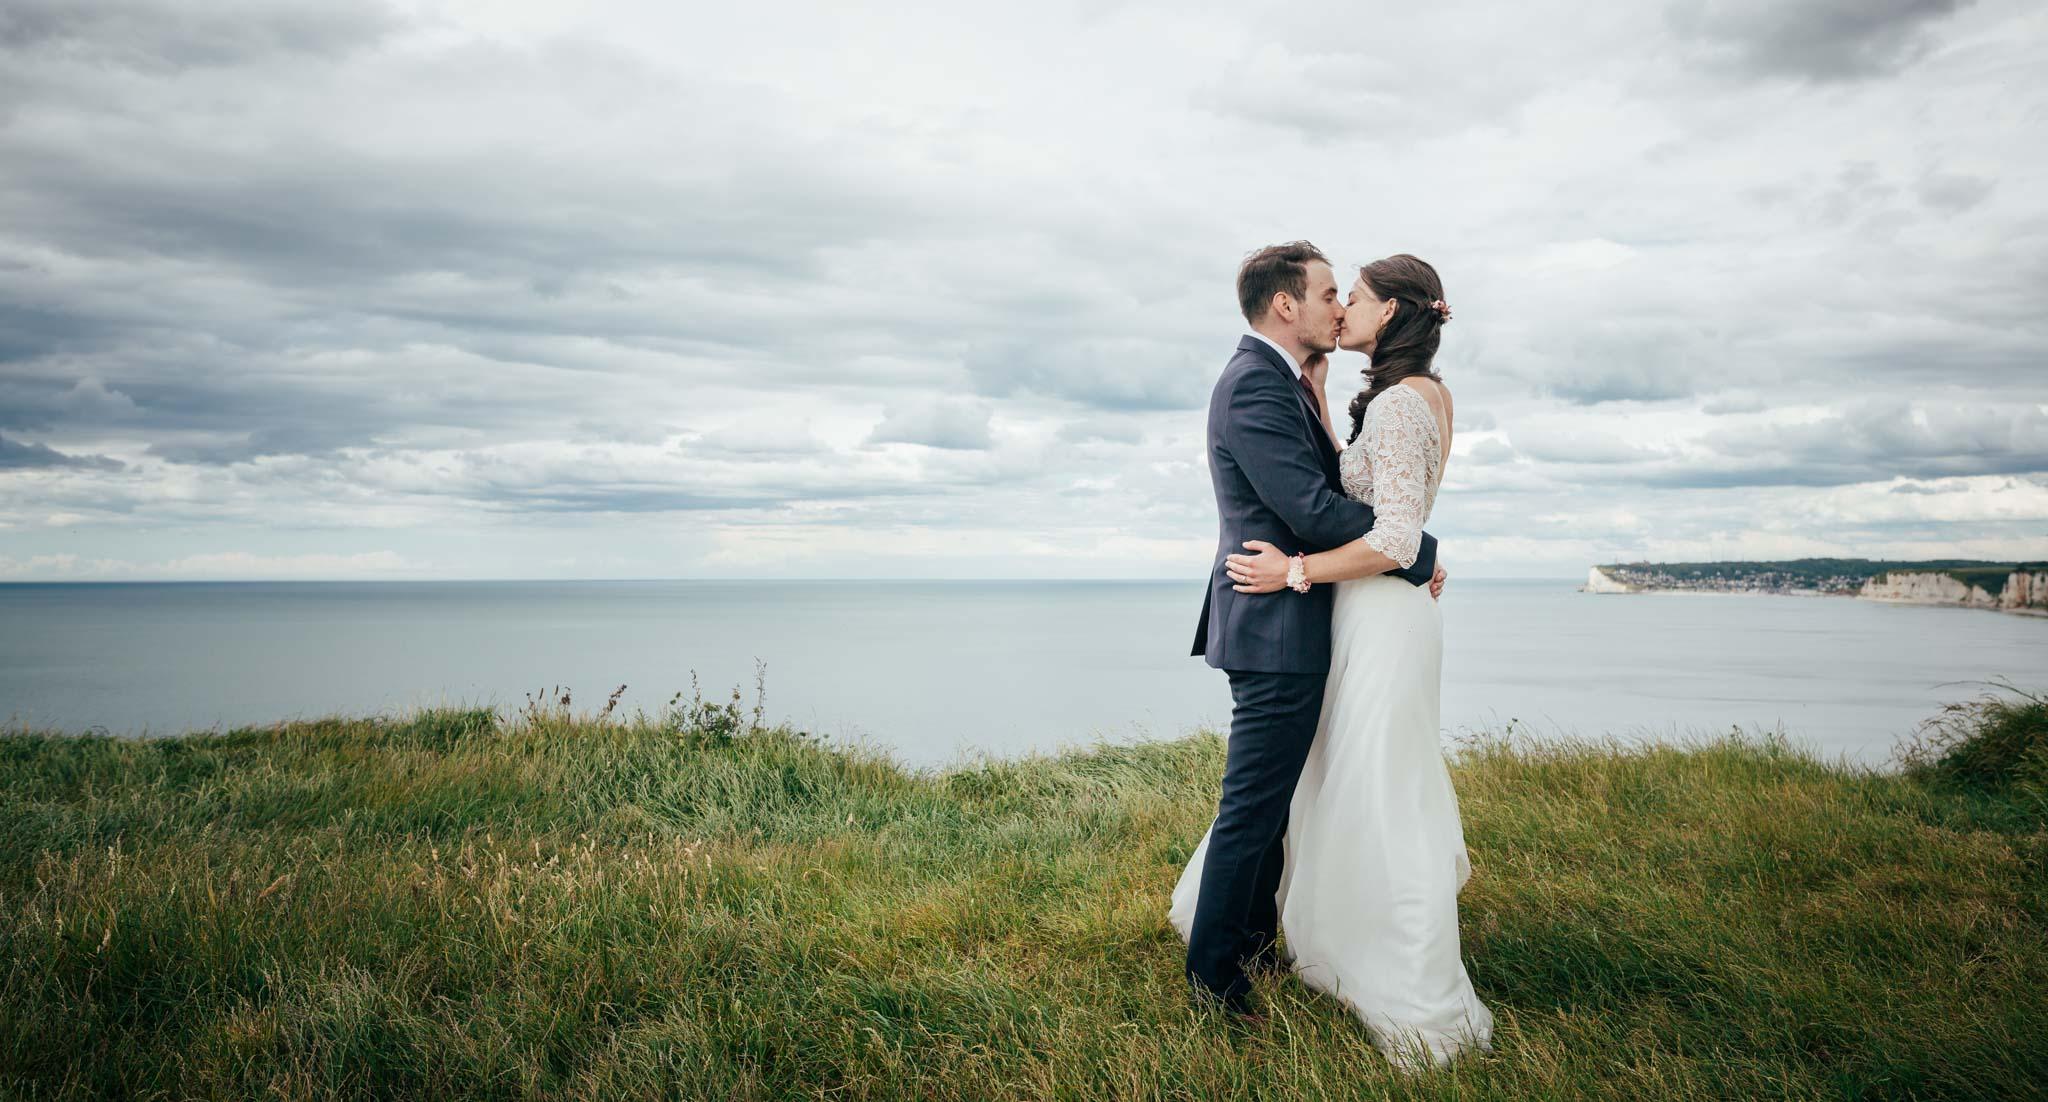 photographe mariage yport étretat normandie